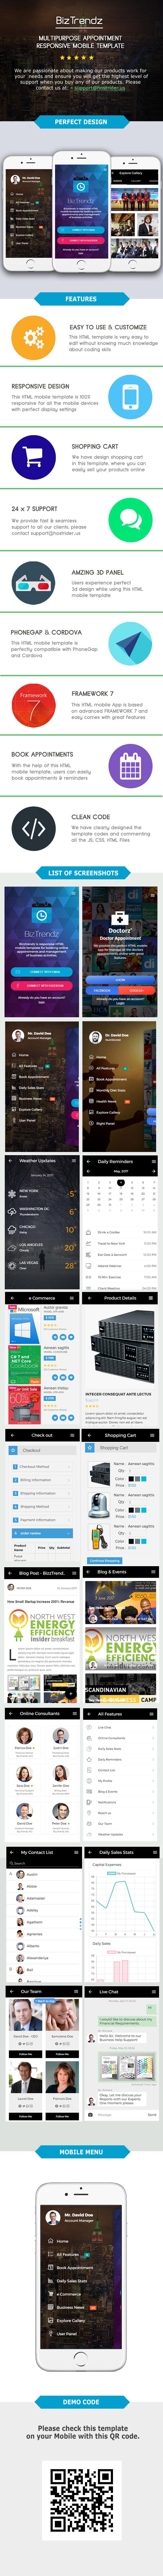 BizTrendz - Multipurpose HTML Mobile Template - 1